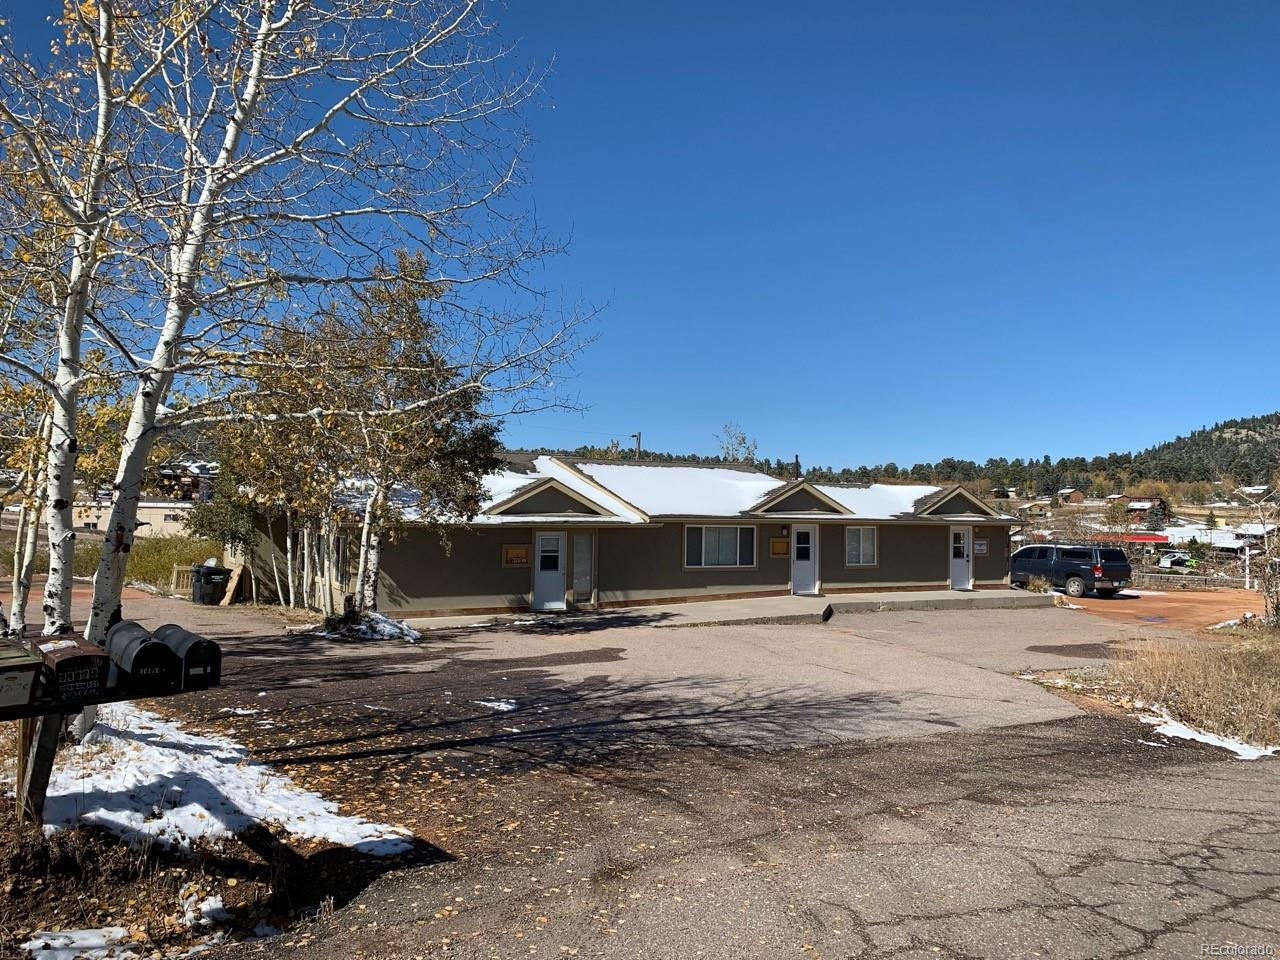 9767 Rhodus Street, Conifer, CO 80433 - Conifer, CO real estate listing